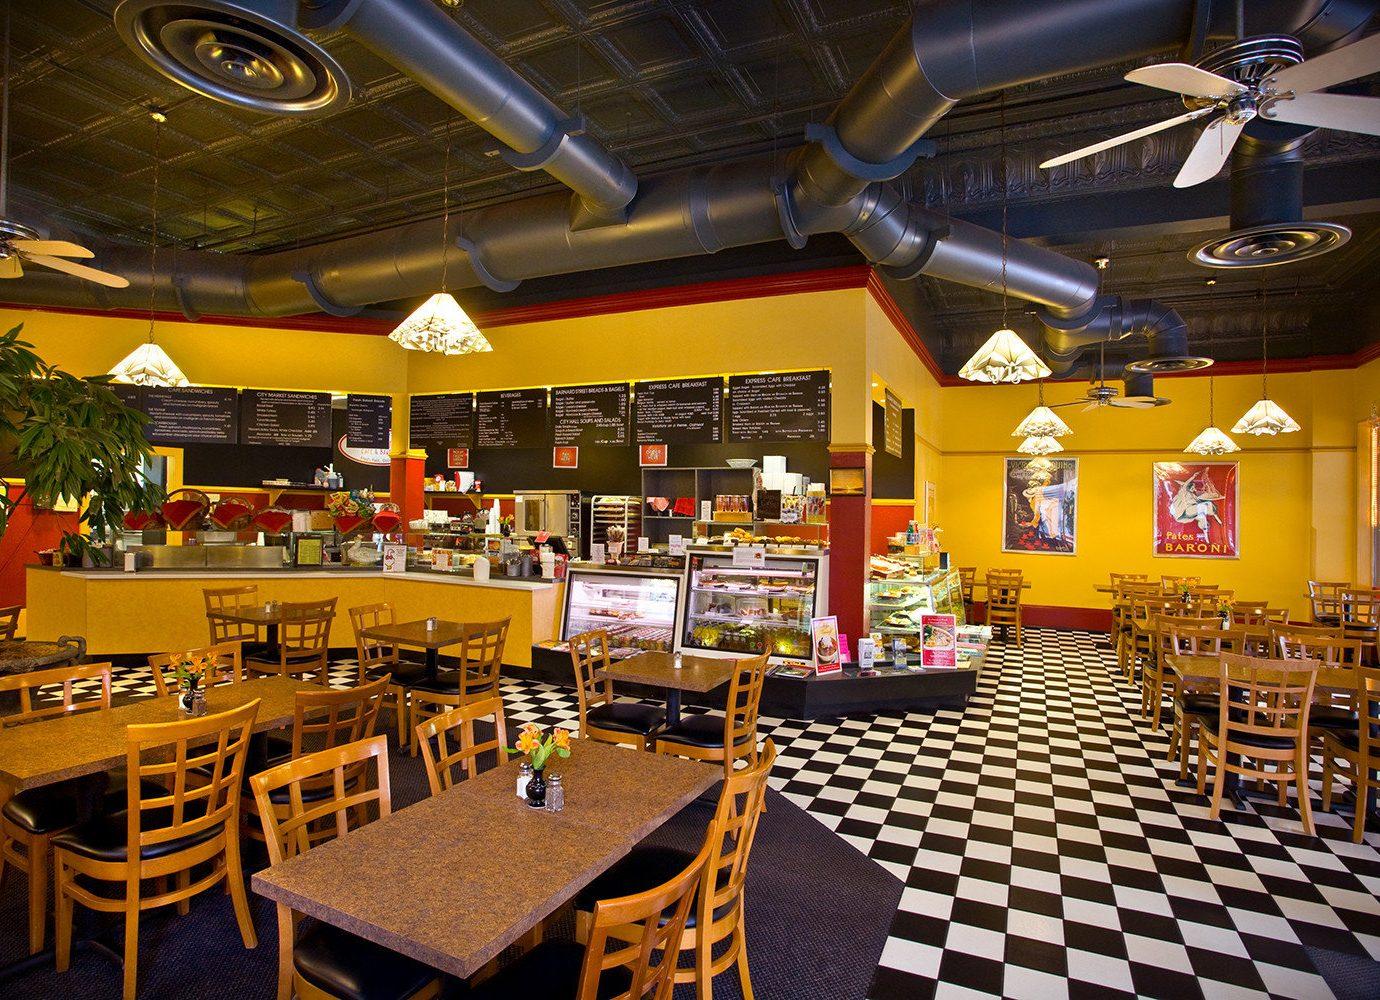 Boutique Hotels Food + Drink Girls Getaways Weekend Getaways ceiling indoor restaurant interior design function hall scene food court café fast food restaurant buffet cafeteria area